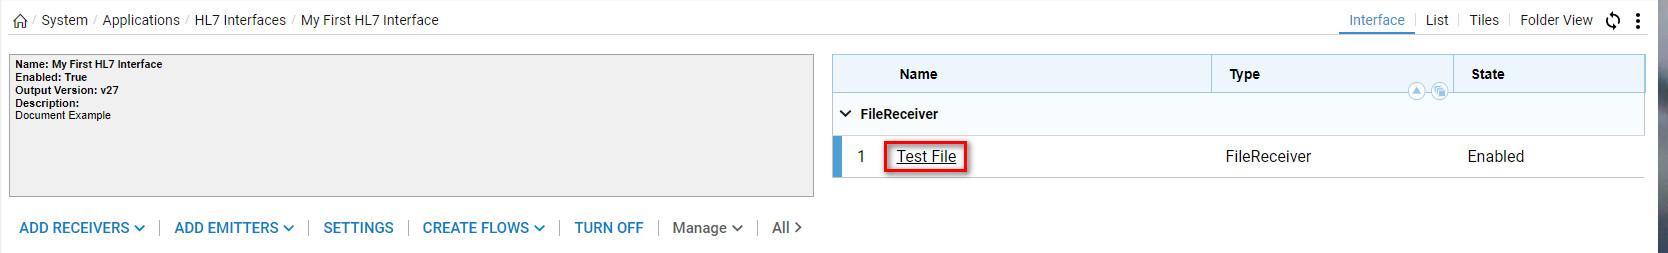 Test-File-1.jpg